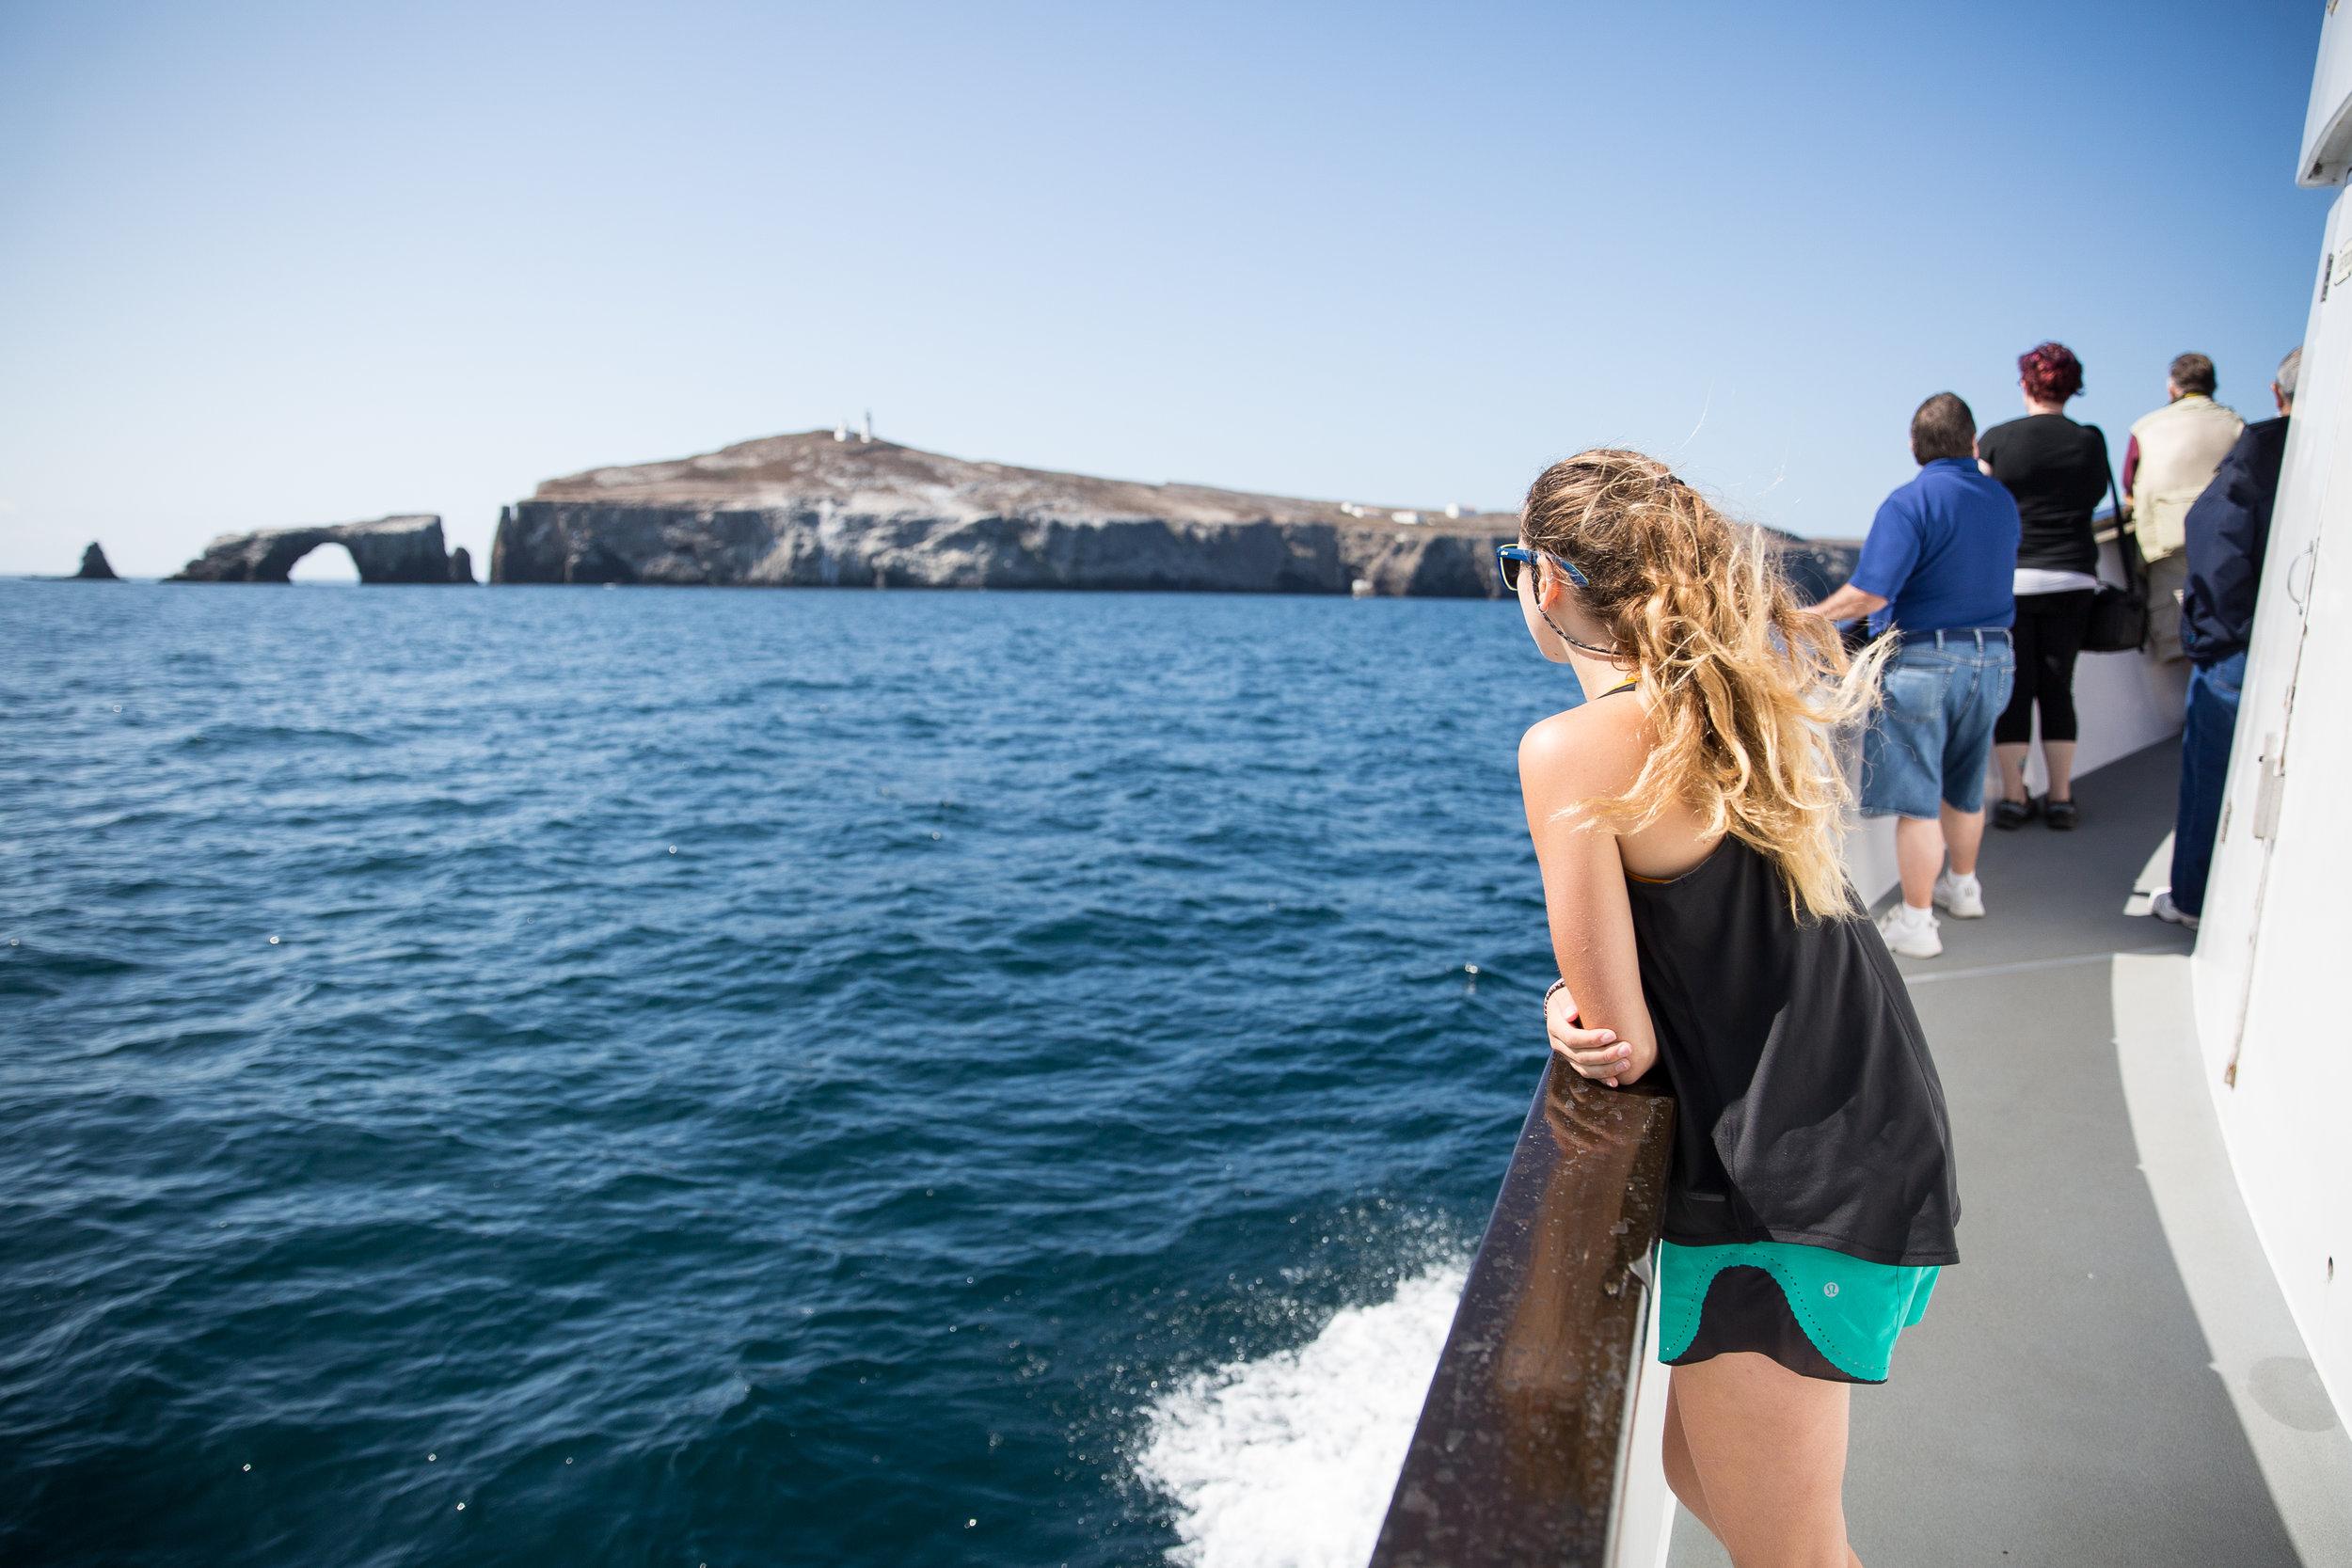 Arriving to Anacapa Island